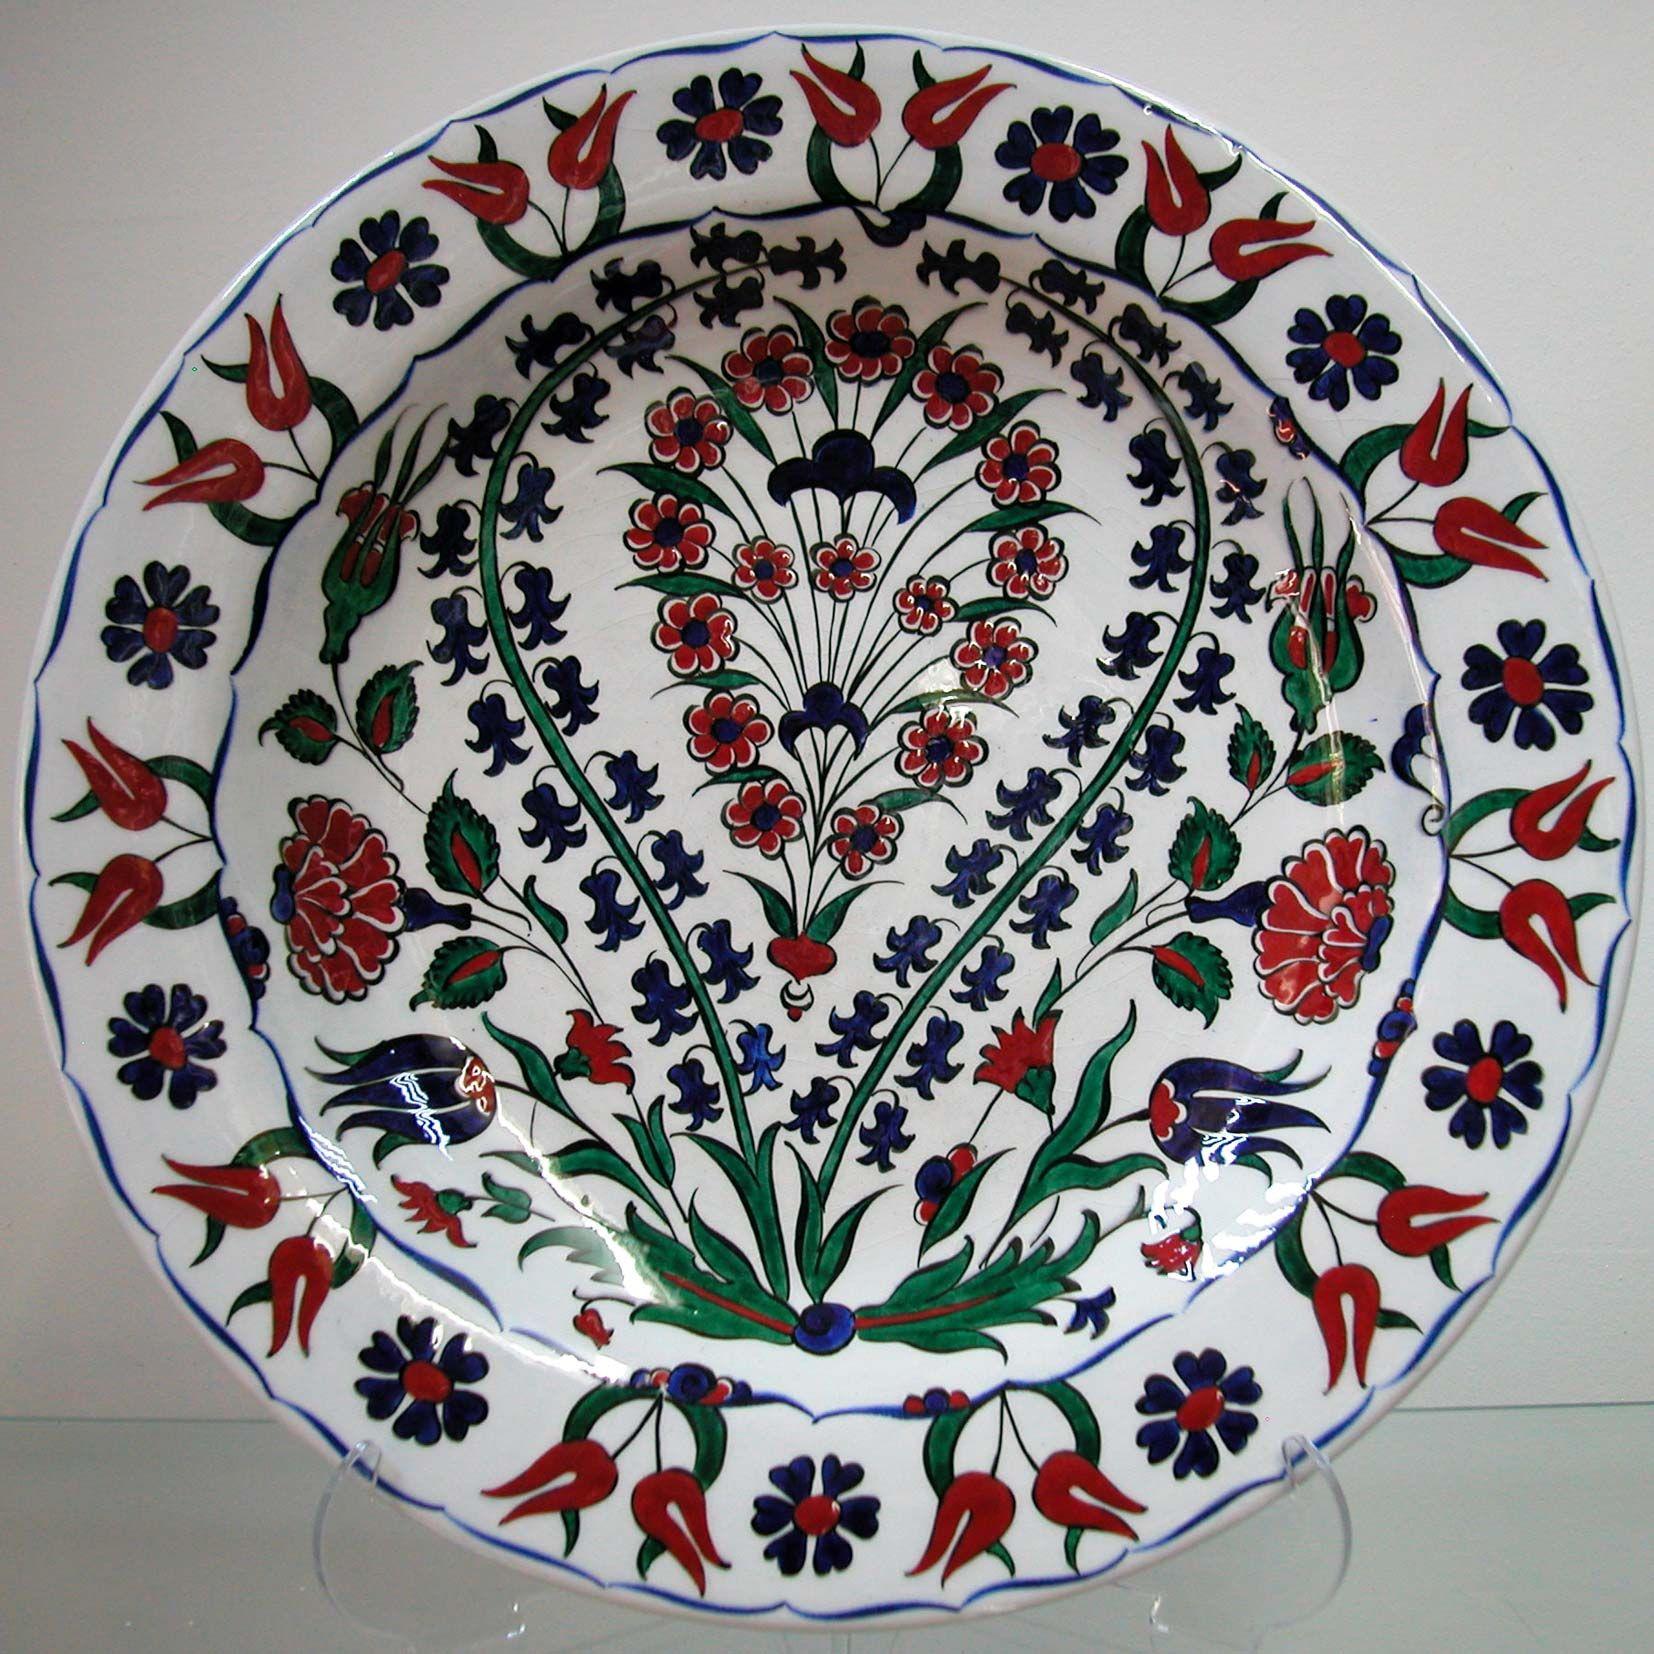 4_b_iznik_ottoman_classics_tiles_original_imitation_16th_century_685.jpg 1.654×1.654 piksel